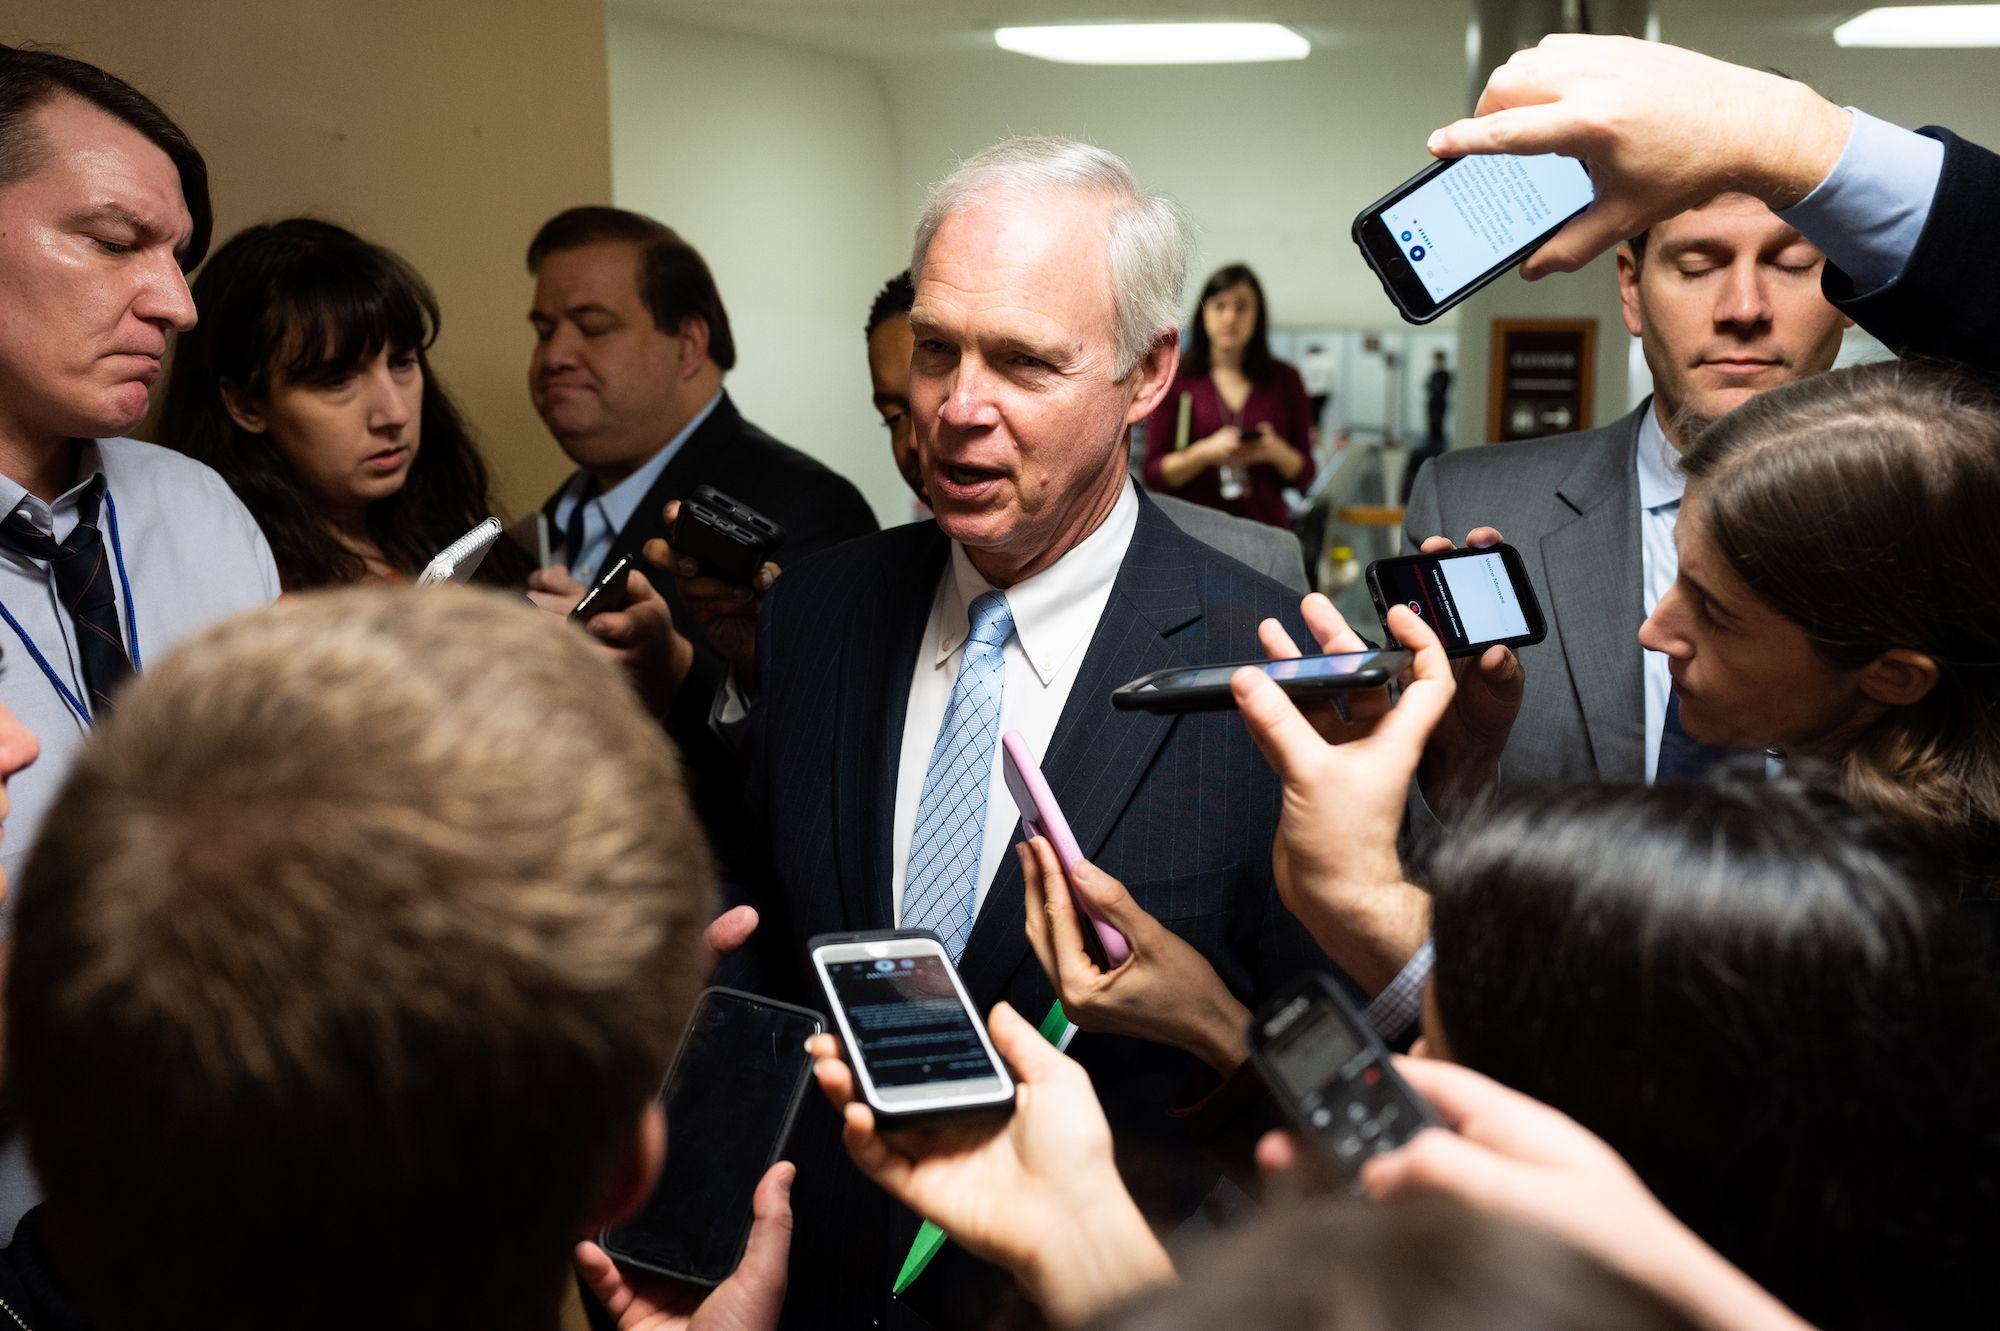 Senate Republicans Star in The Chickening Amid Trump's Retribution Frenzy